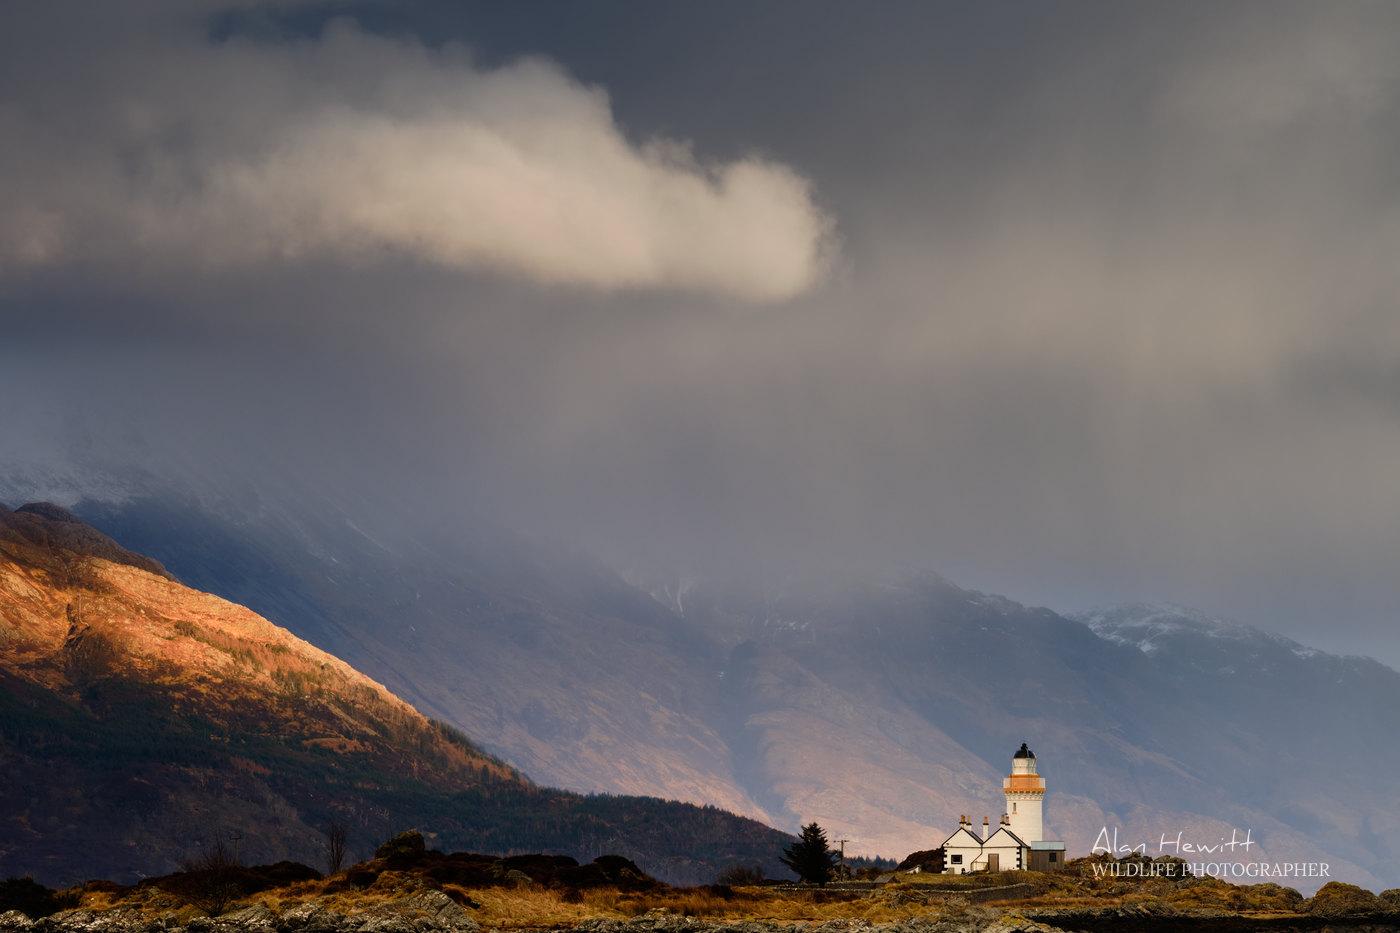 Isle Ornsay, Isle of Skye, Fujifilm X-H1 & Fujinon 100-400mm f/4.5-f/5.6 & 3 stop grad